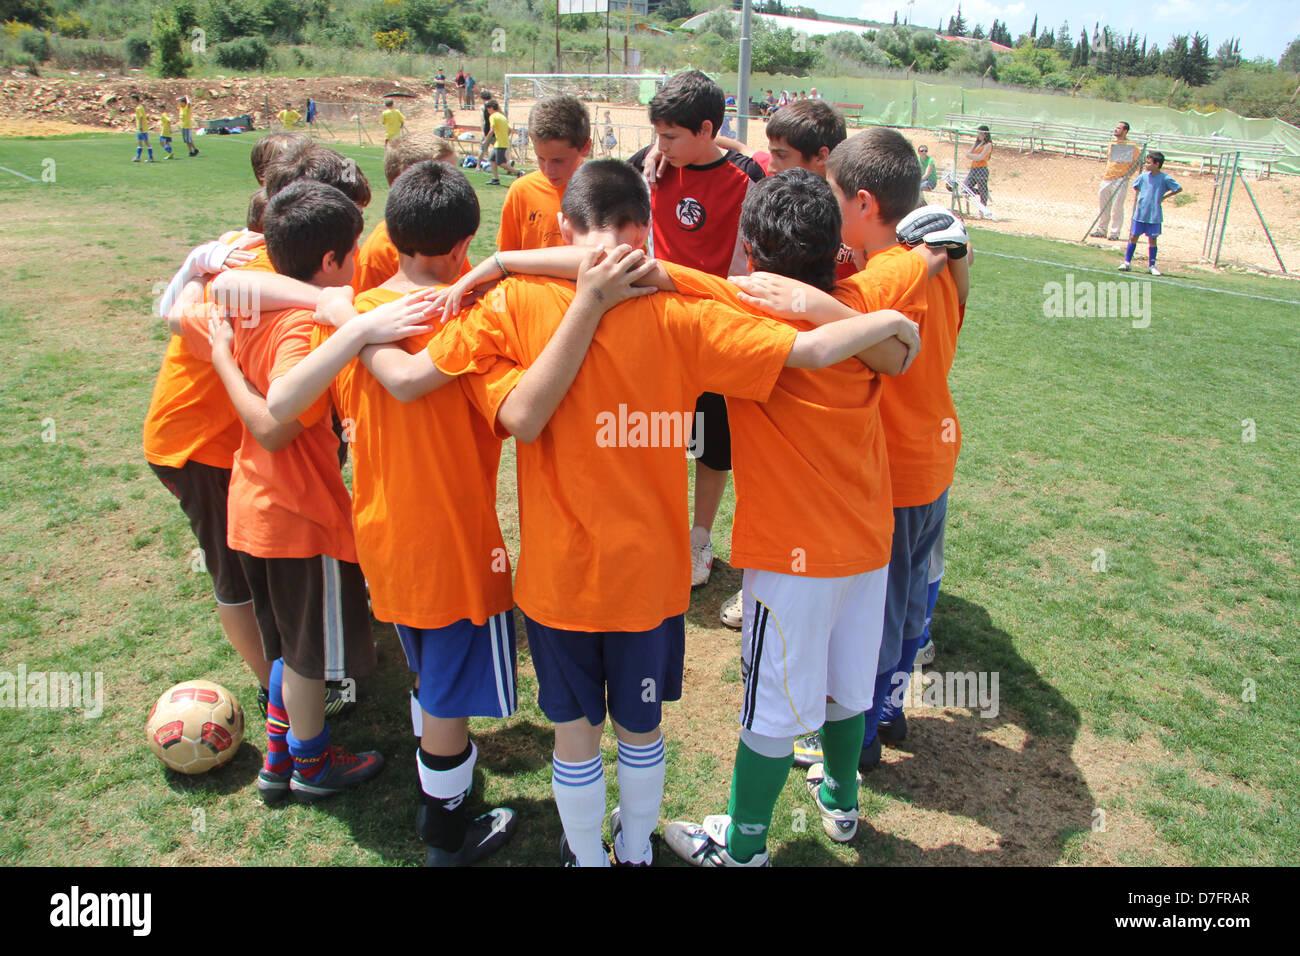 Kammon boys' soccer team gets ready to begin a game in Misgav - Stock Image